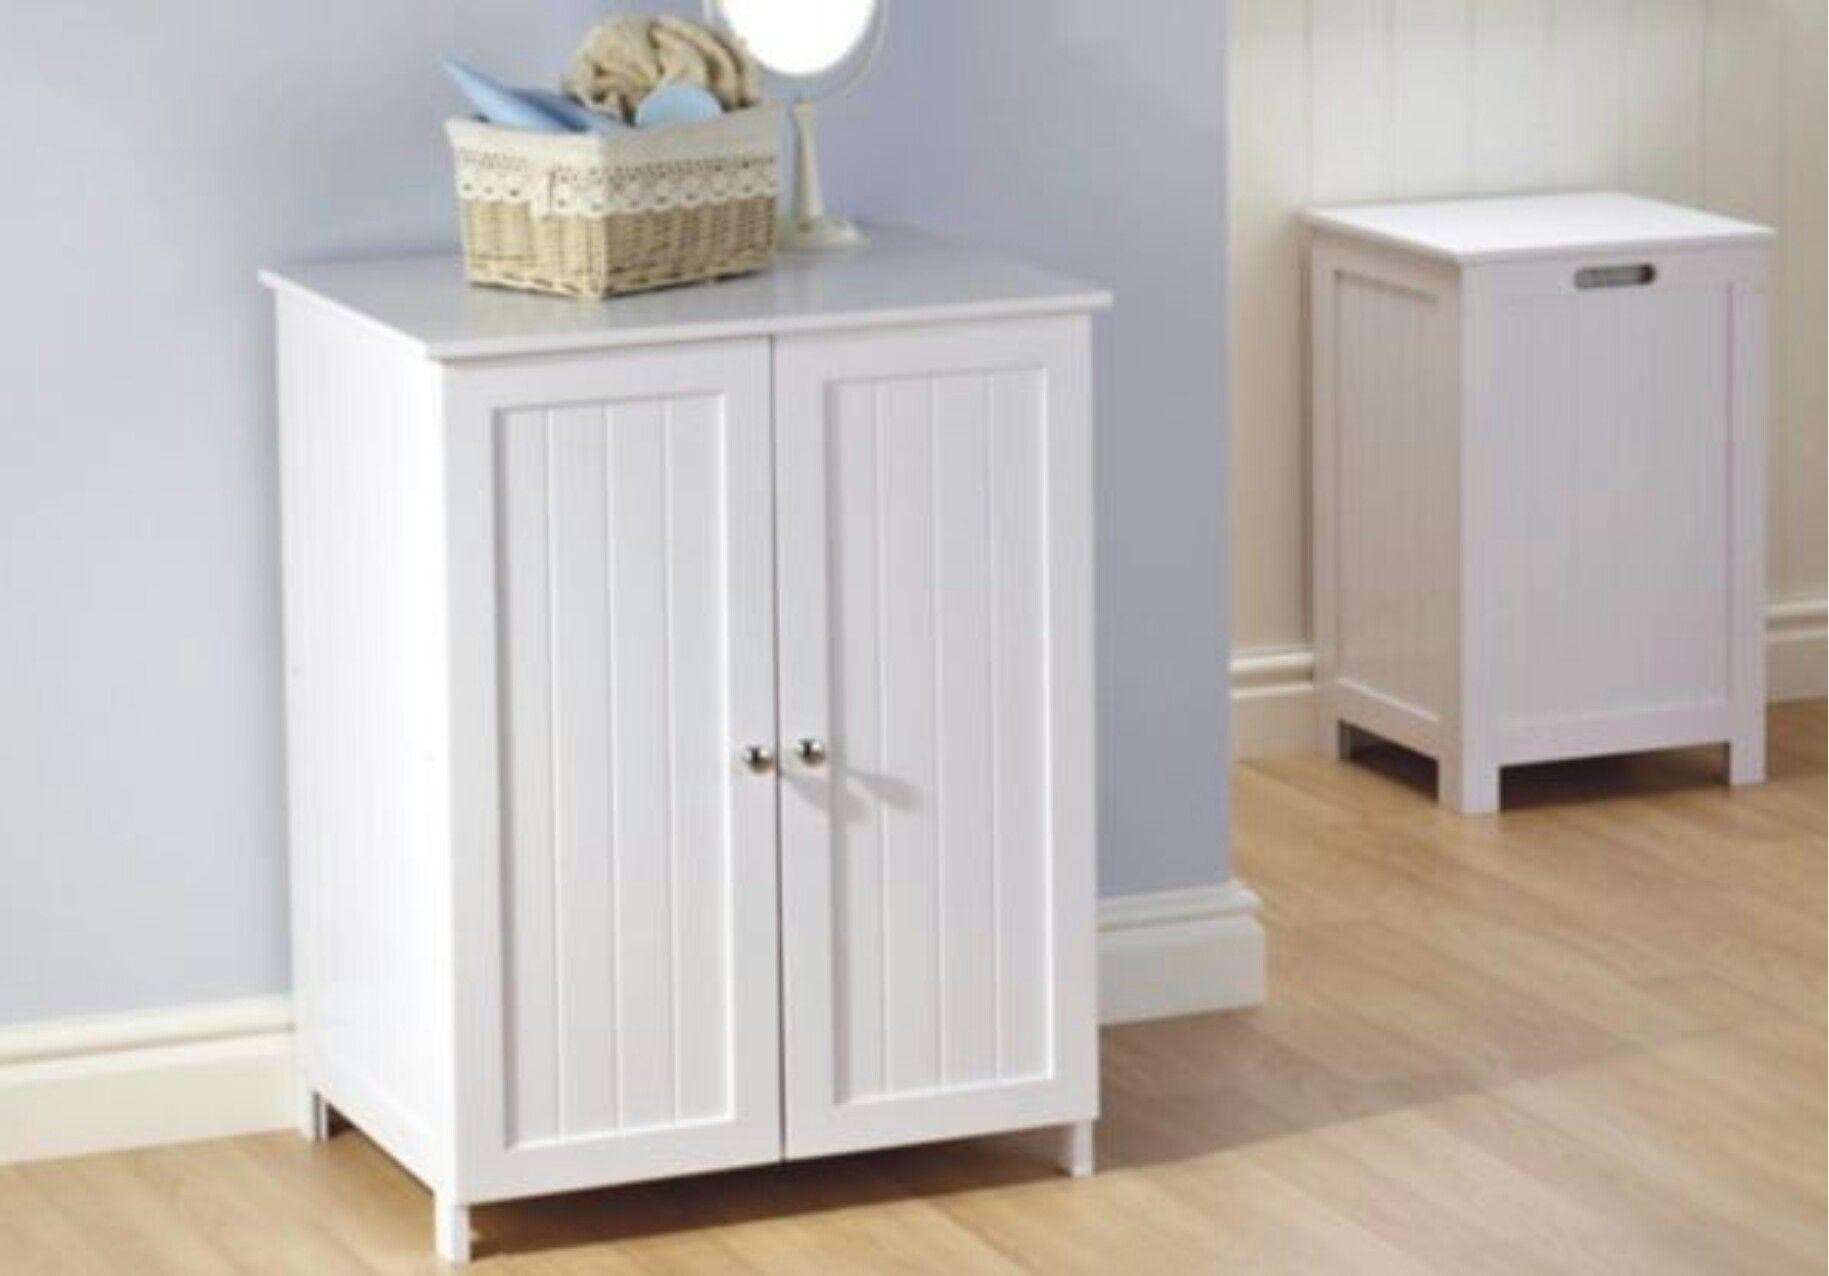 b q bathroom cabinets | Creativeadvertisingblog.com